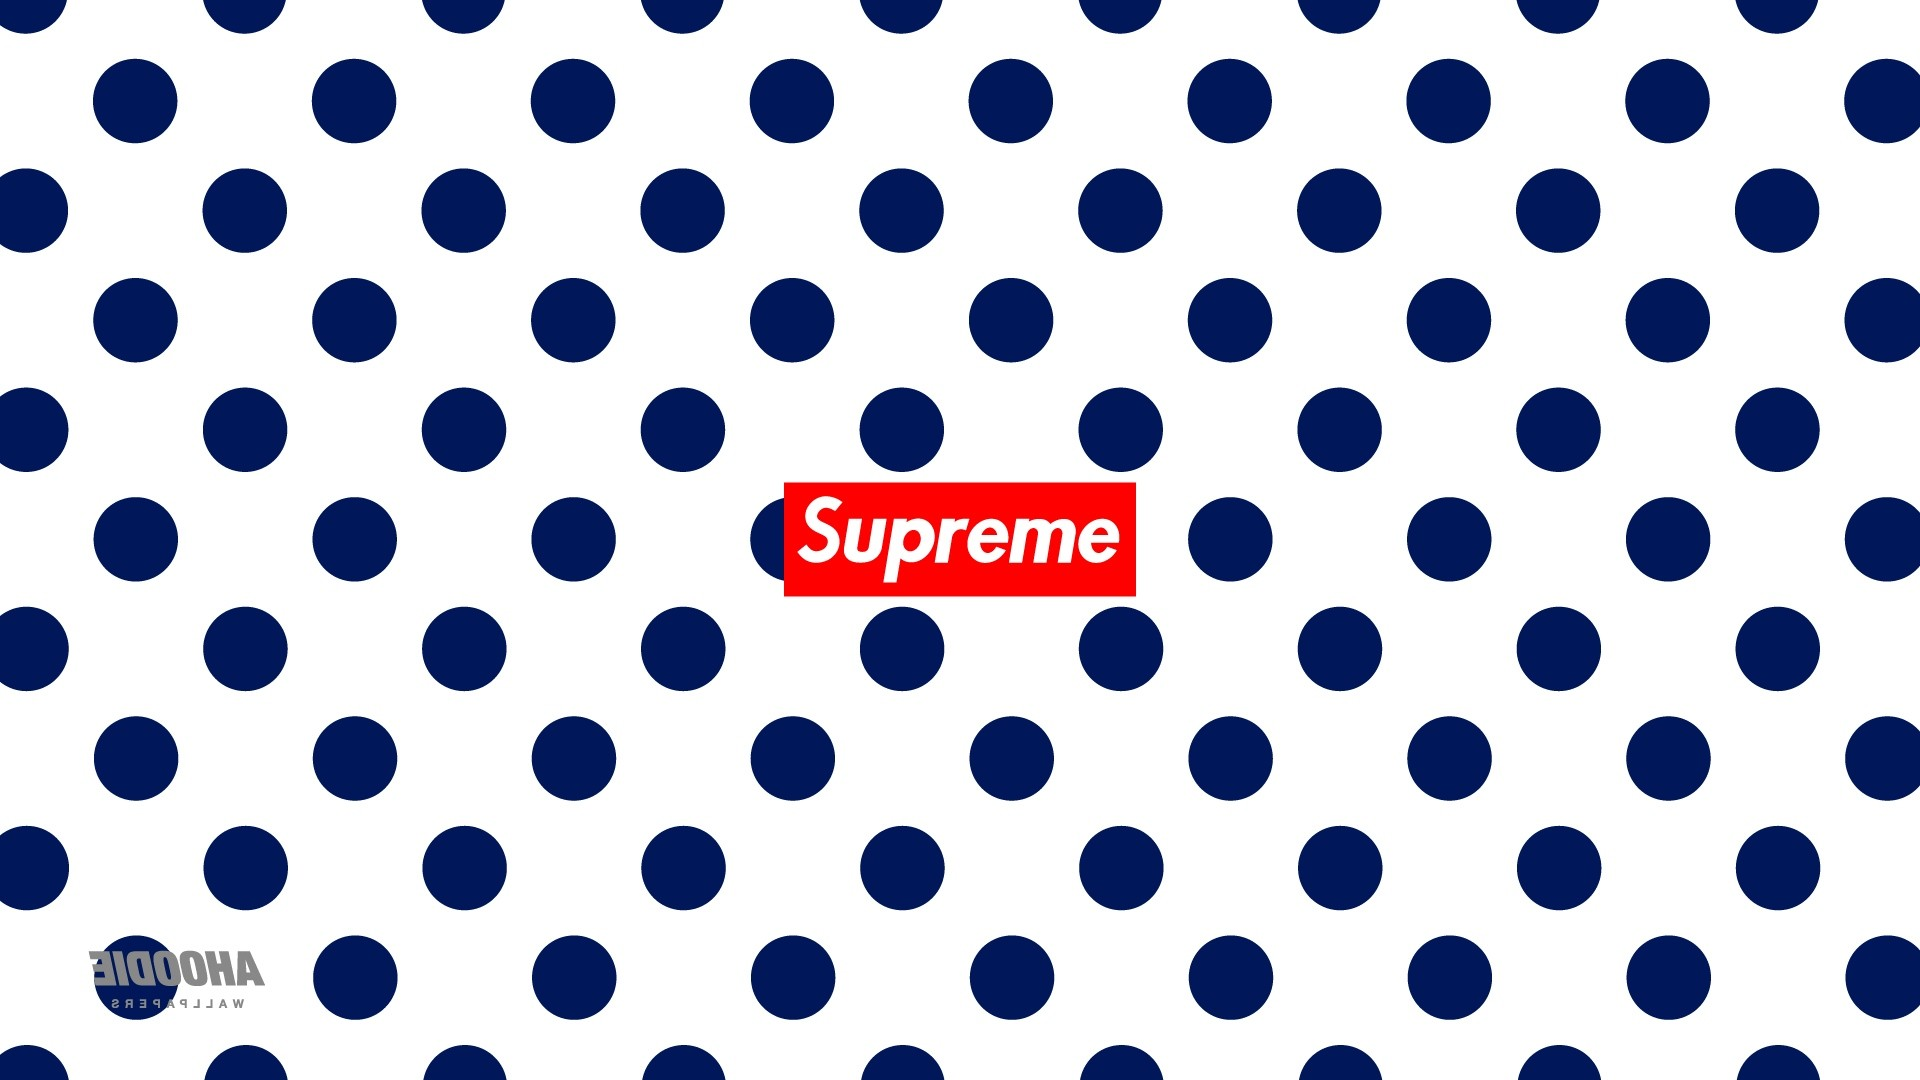 Supreme Wallpaper Tumblr Supreme wallpaper tumblr